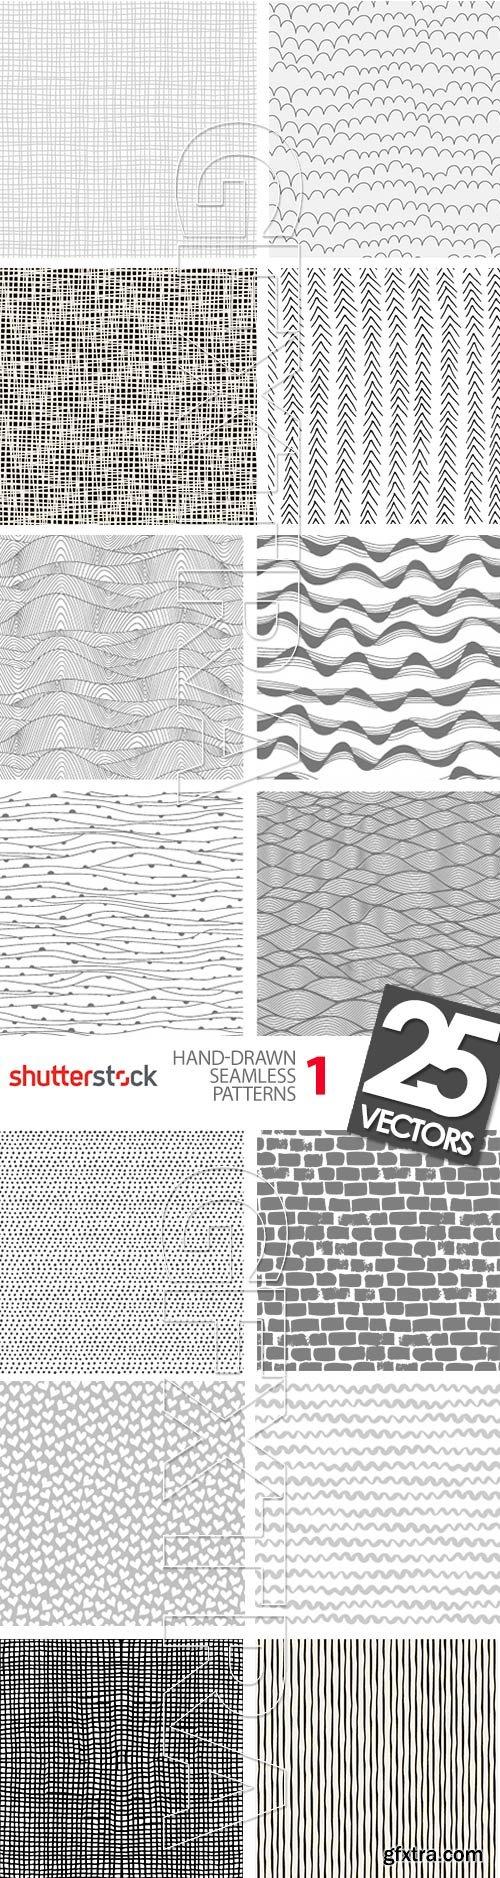 Hand-Drawn Seamless Patterns 1, 25xEPS